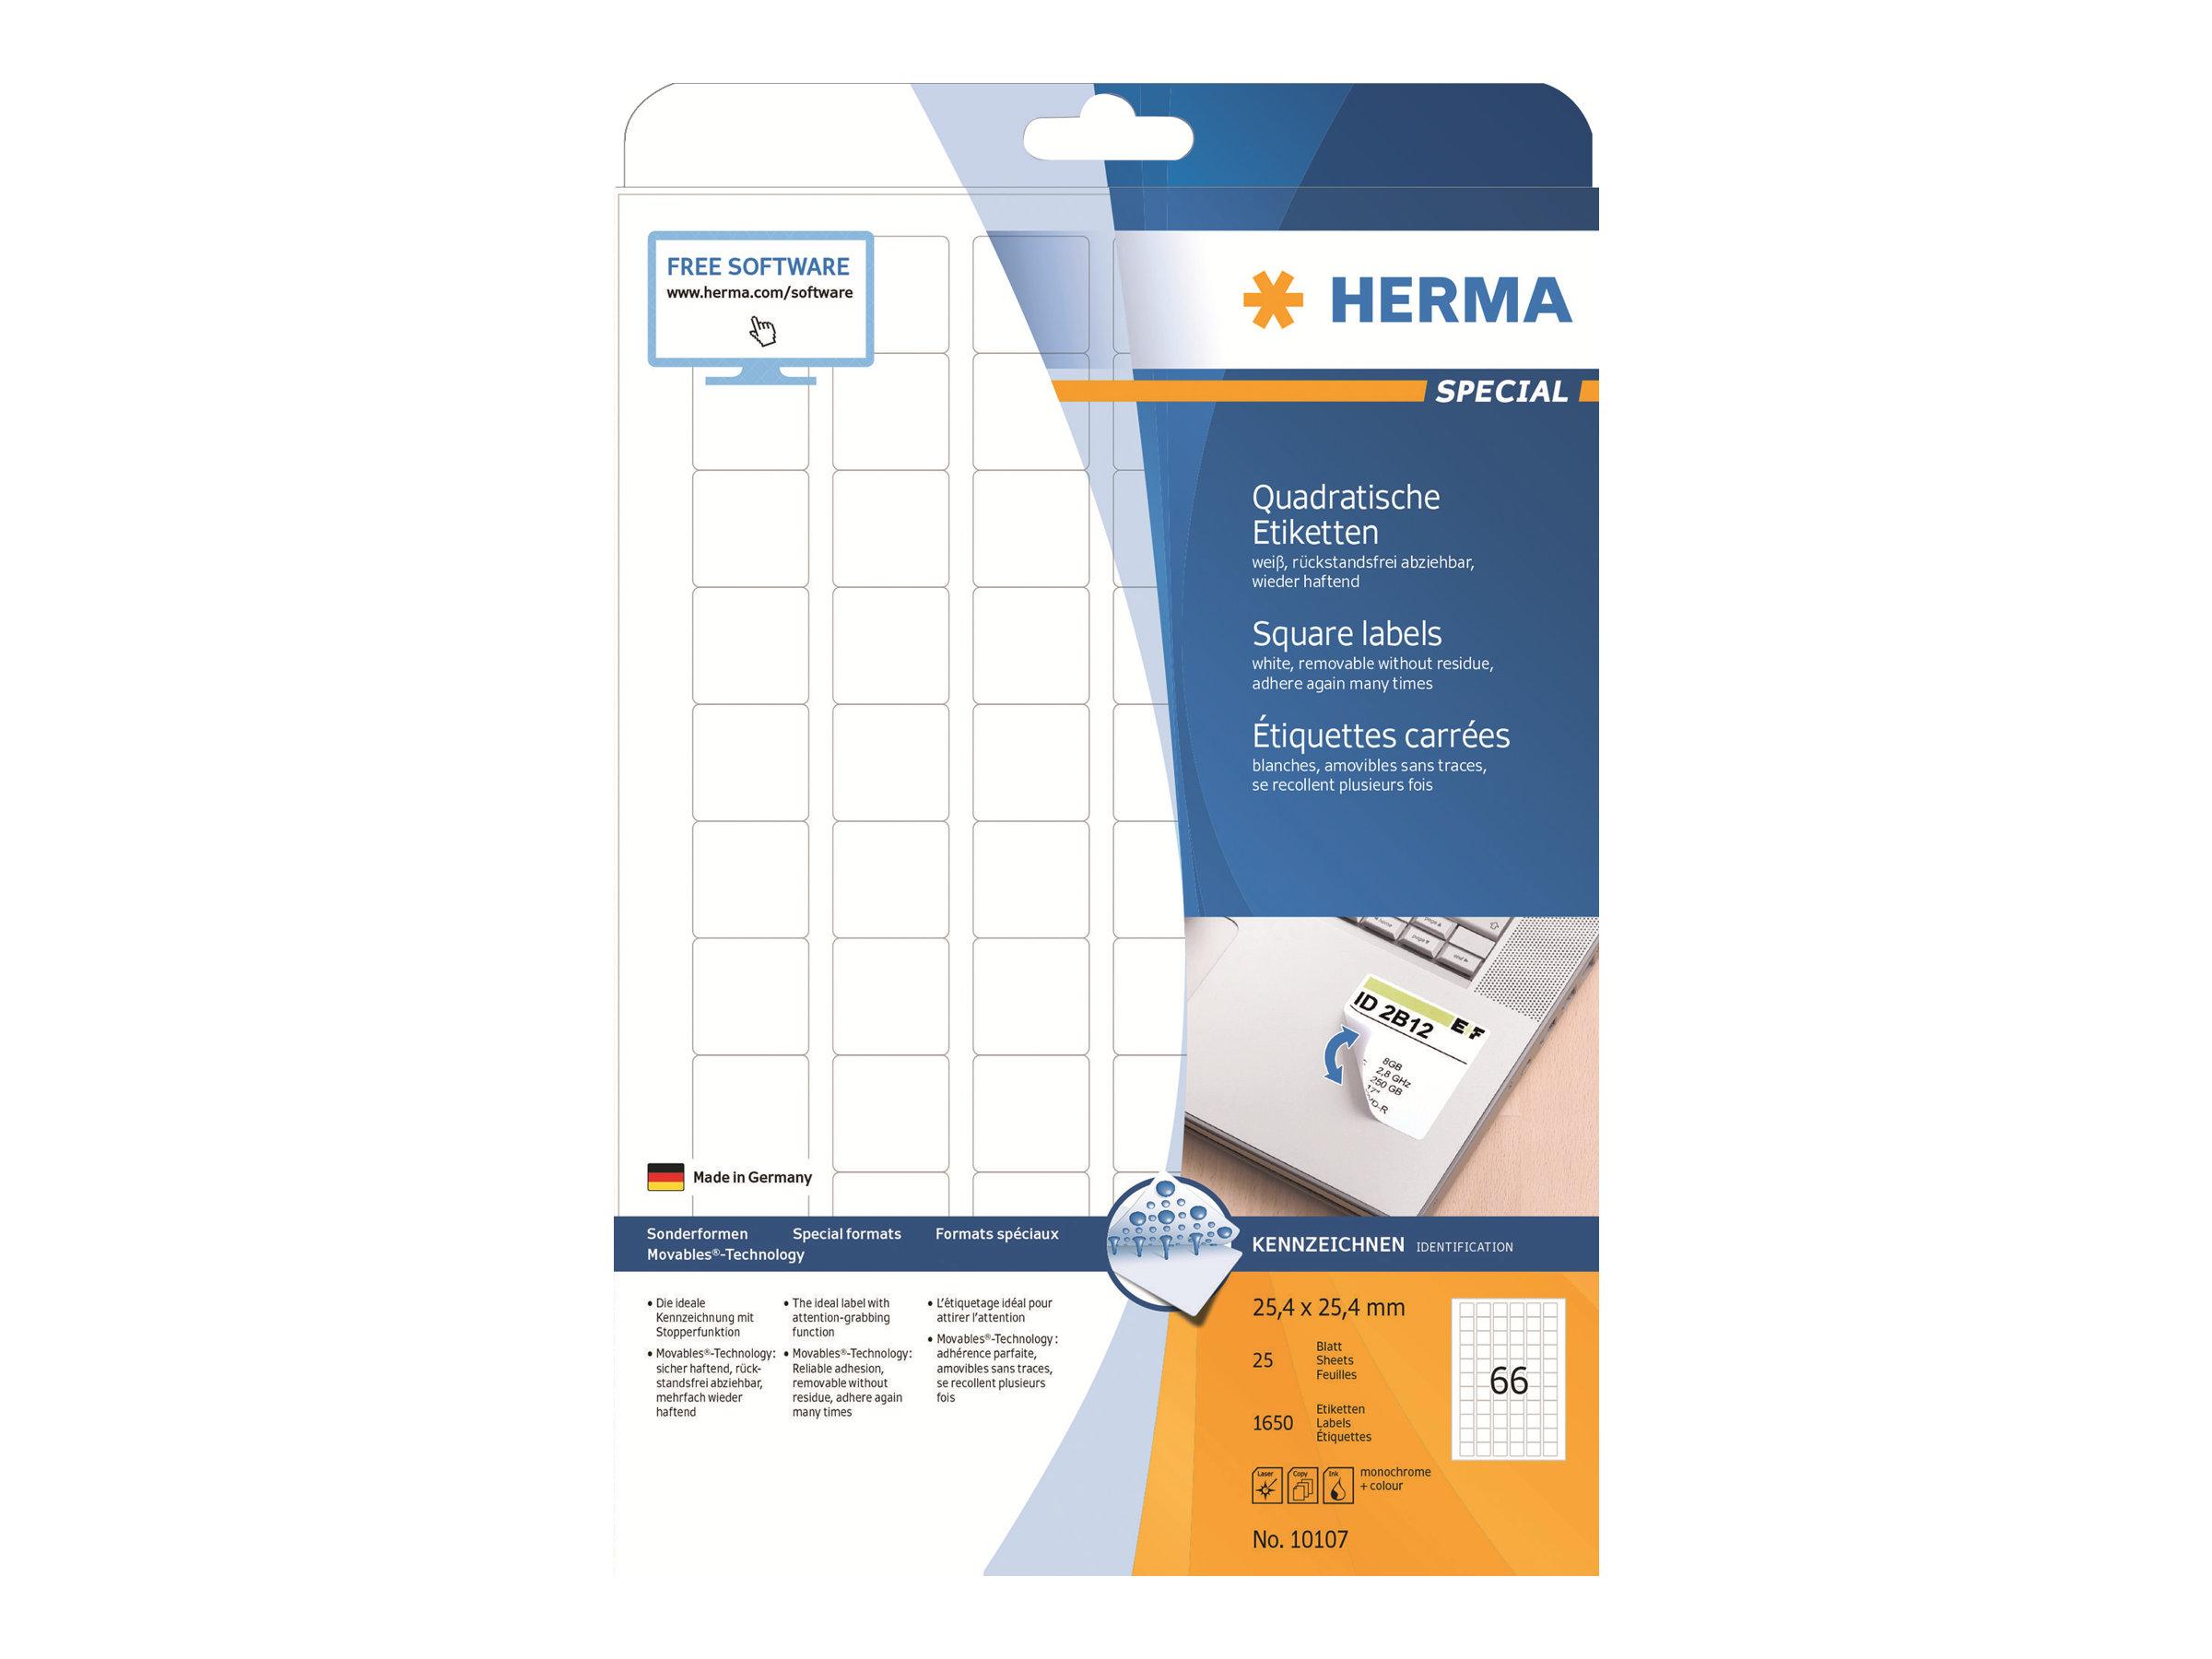 HERMA Special - Papier - matt - selbstklebend, entfernbarer Klebstoff - weiß - 25.4 x 25.4 mm 1650 Etikett(en) (25 Bogen x 66)